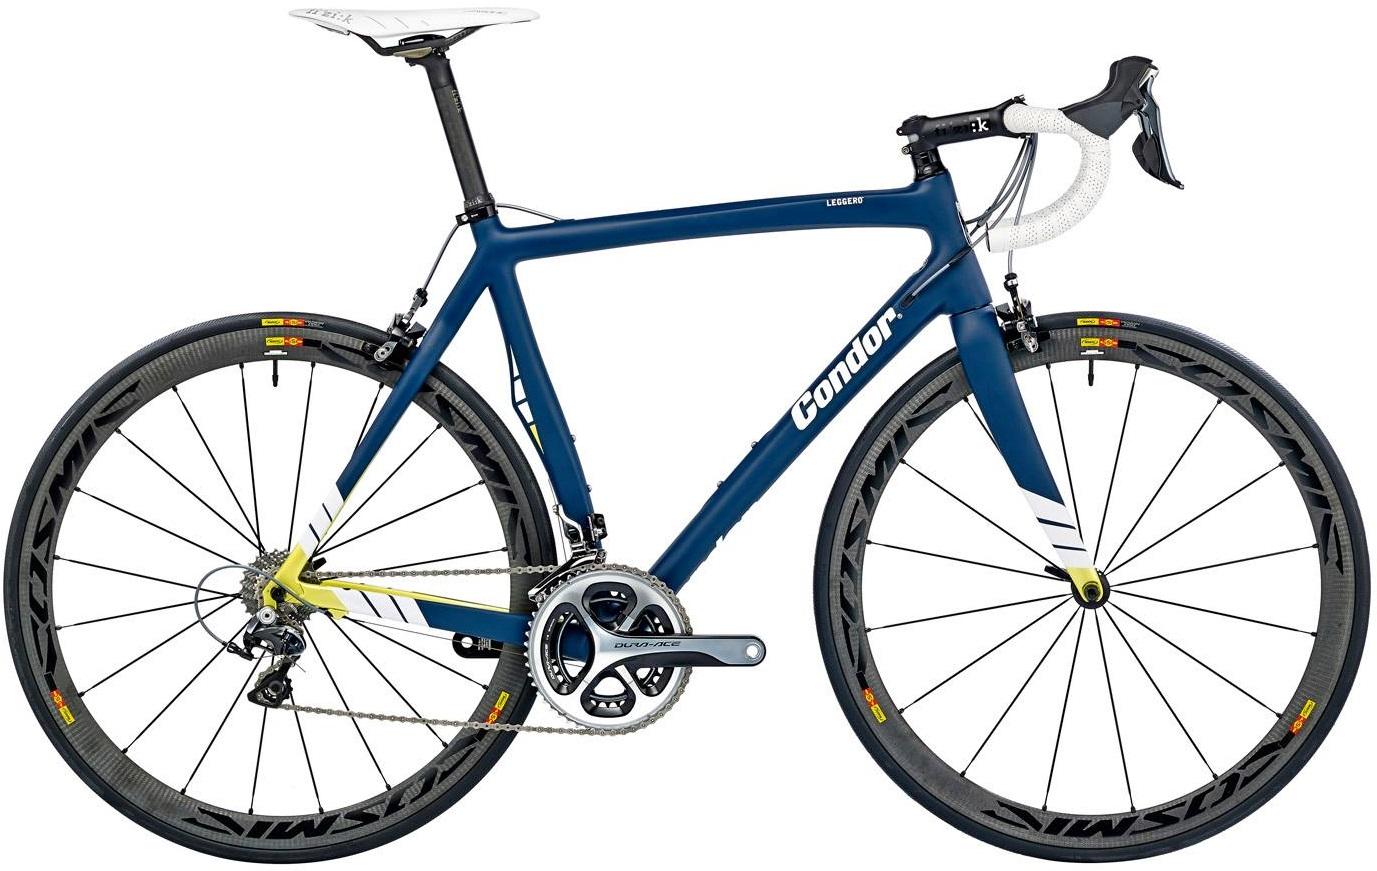 2015 Condor Leggero blue yellow dura aceneuroticarnutz2015 Condor Leggero blue yellow dura ace2014 granville sonic 10 ultegra blue yellow